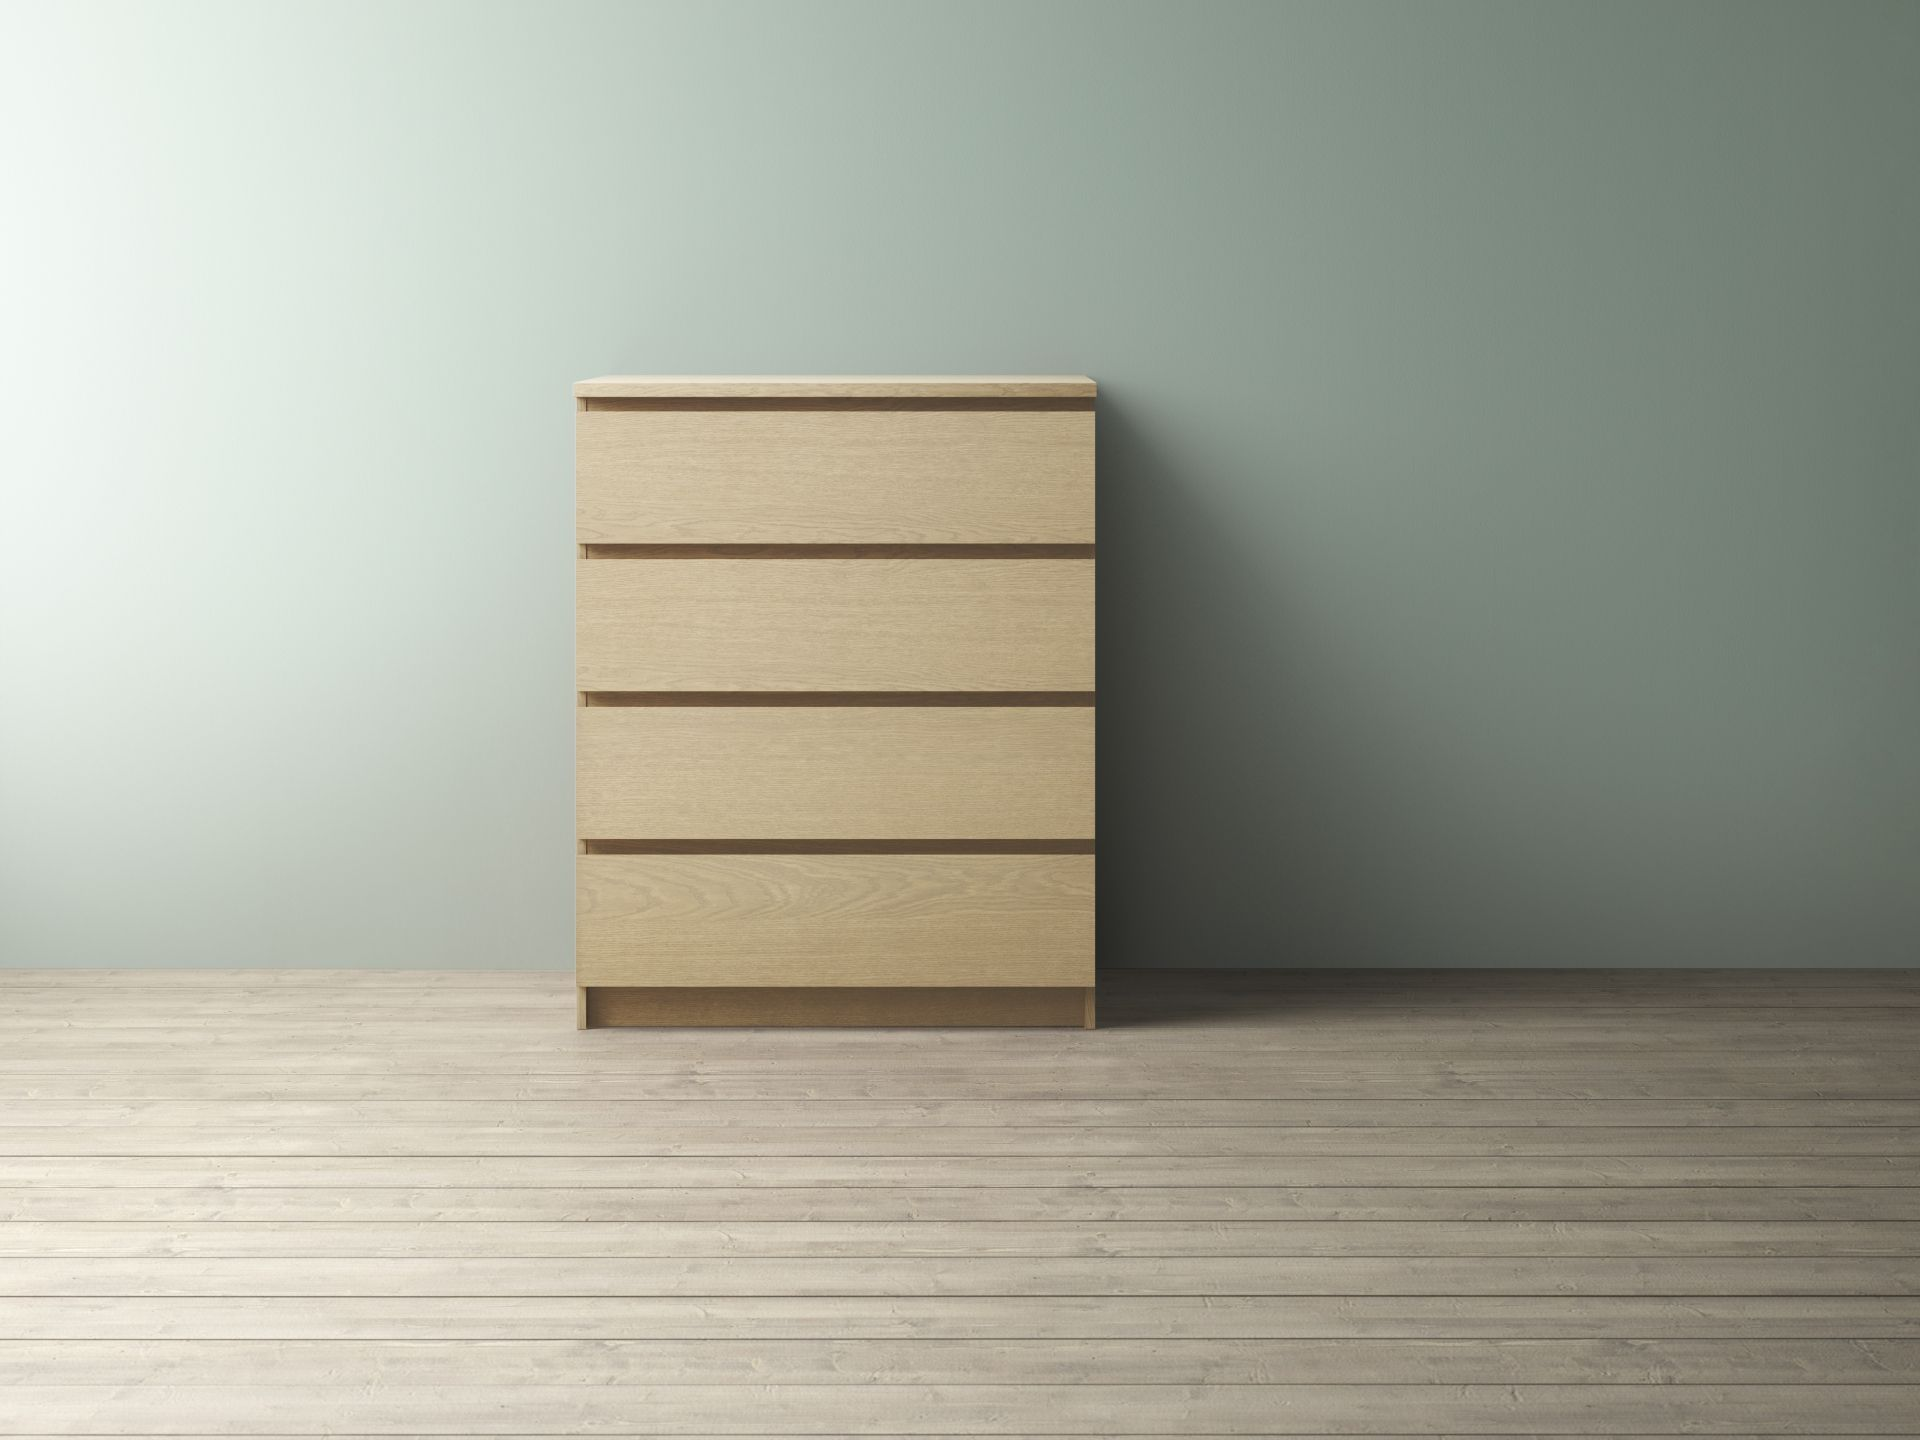 Slaapkamer Commode Ikea : Malm ladekast met 4 lades wit gelazuurd eikenfineer ikea